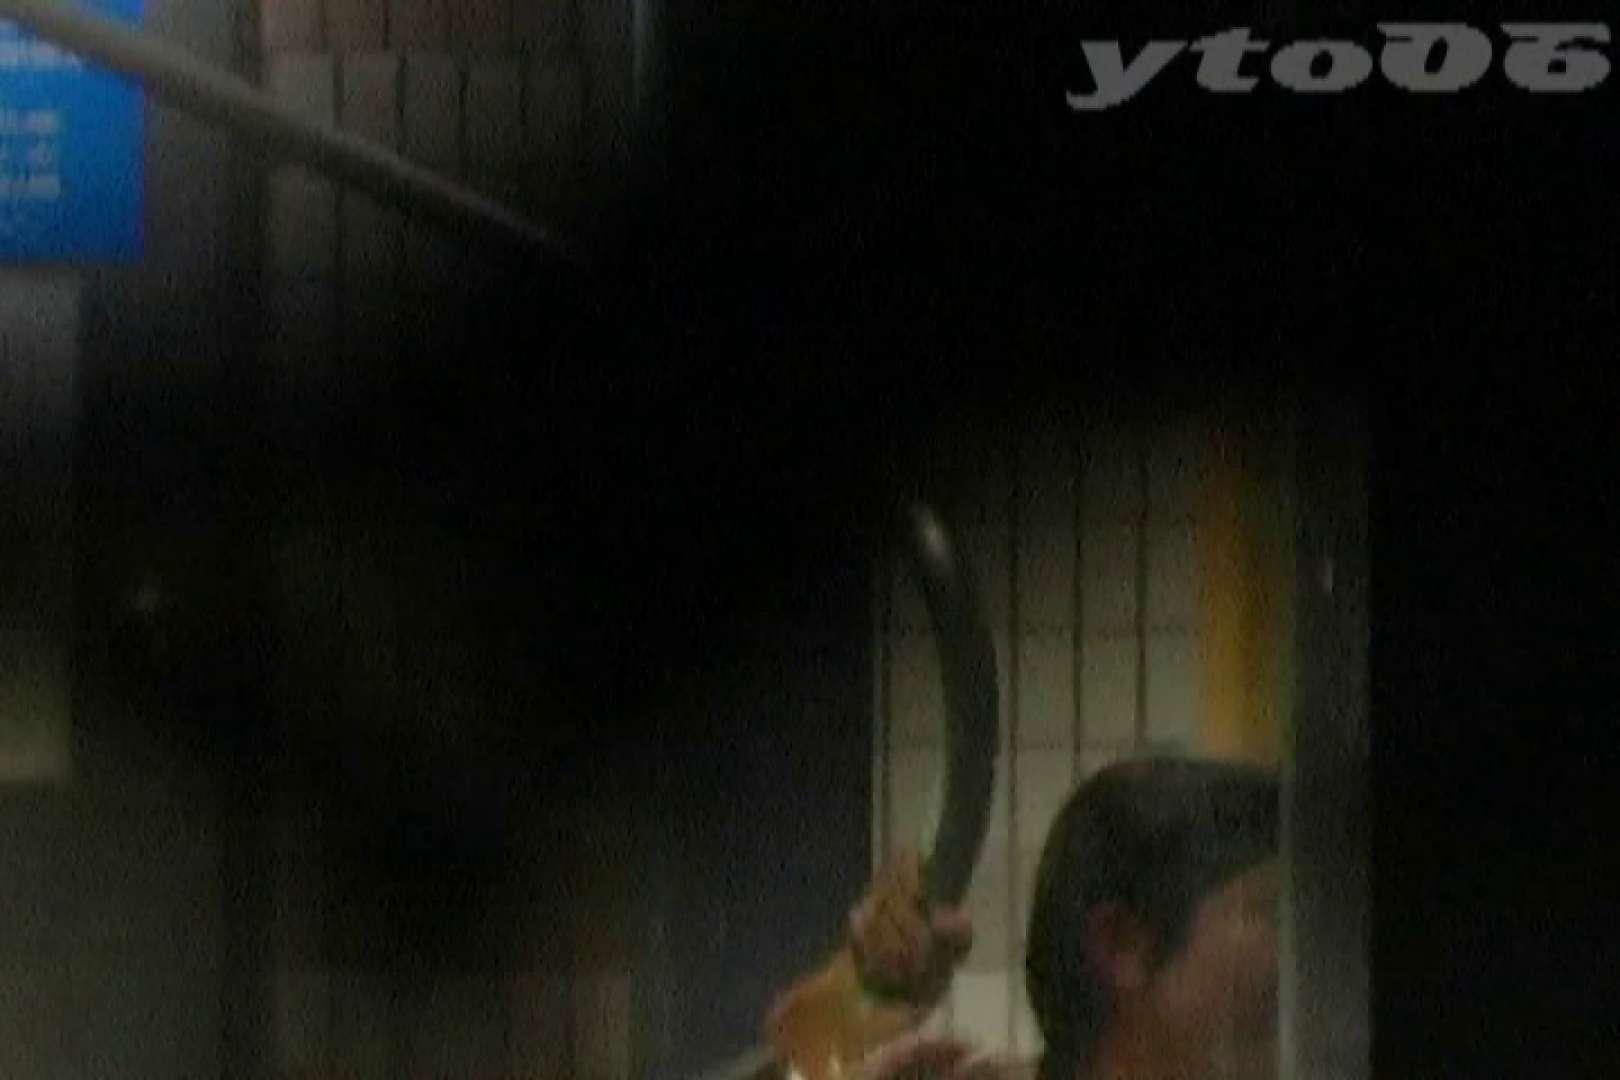 ▲復活限定▲合宿ホテル女風呂盗撮 Vol.34 合宿 ワレメ無修正動画無料 107枚 23